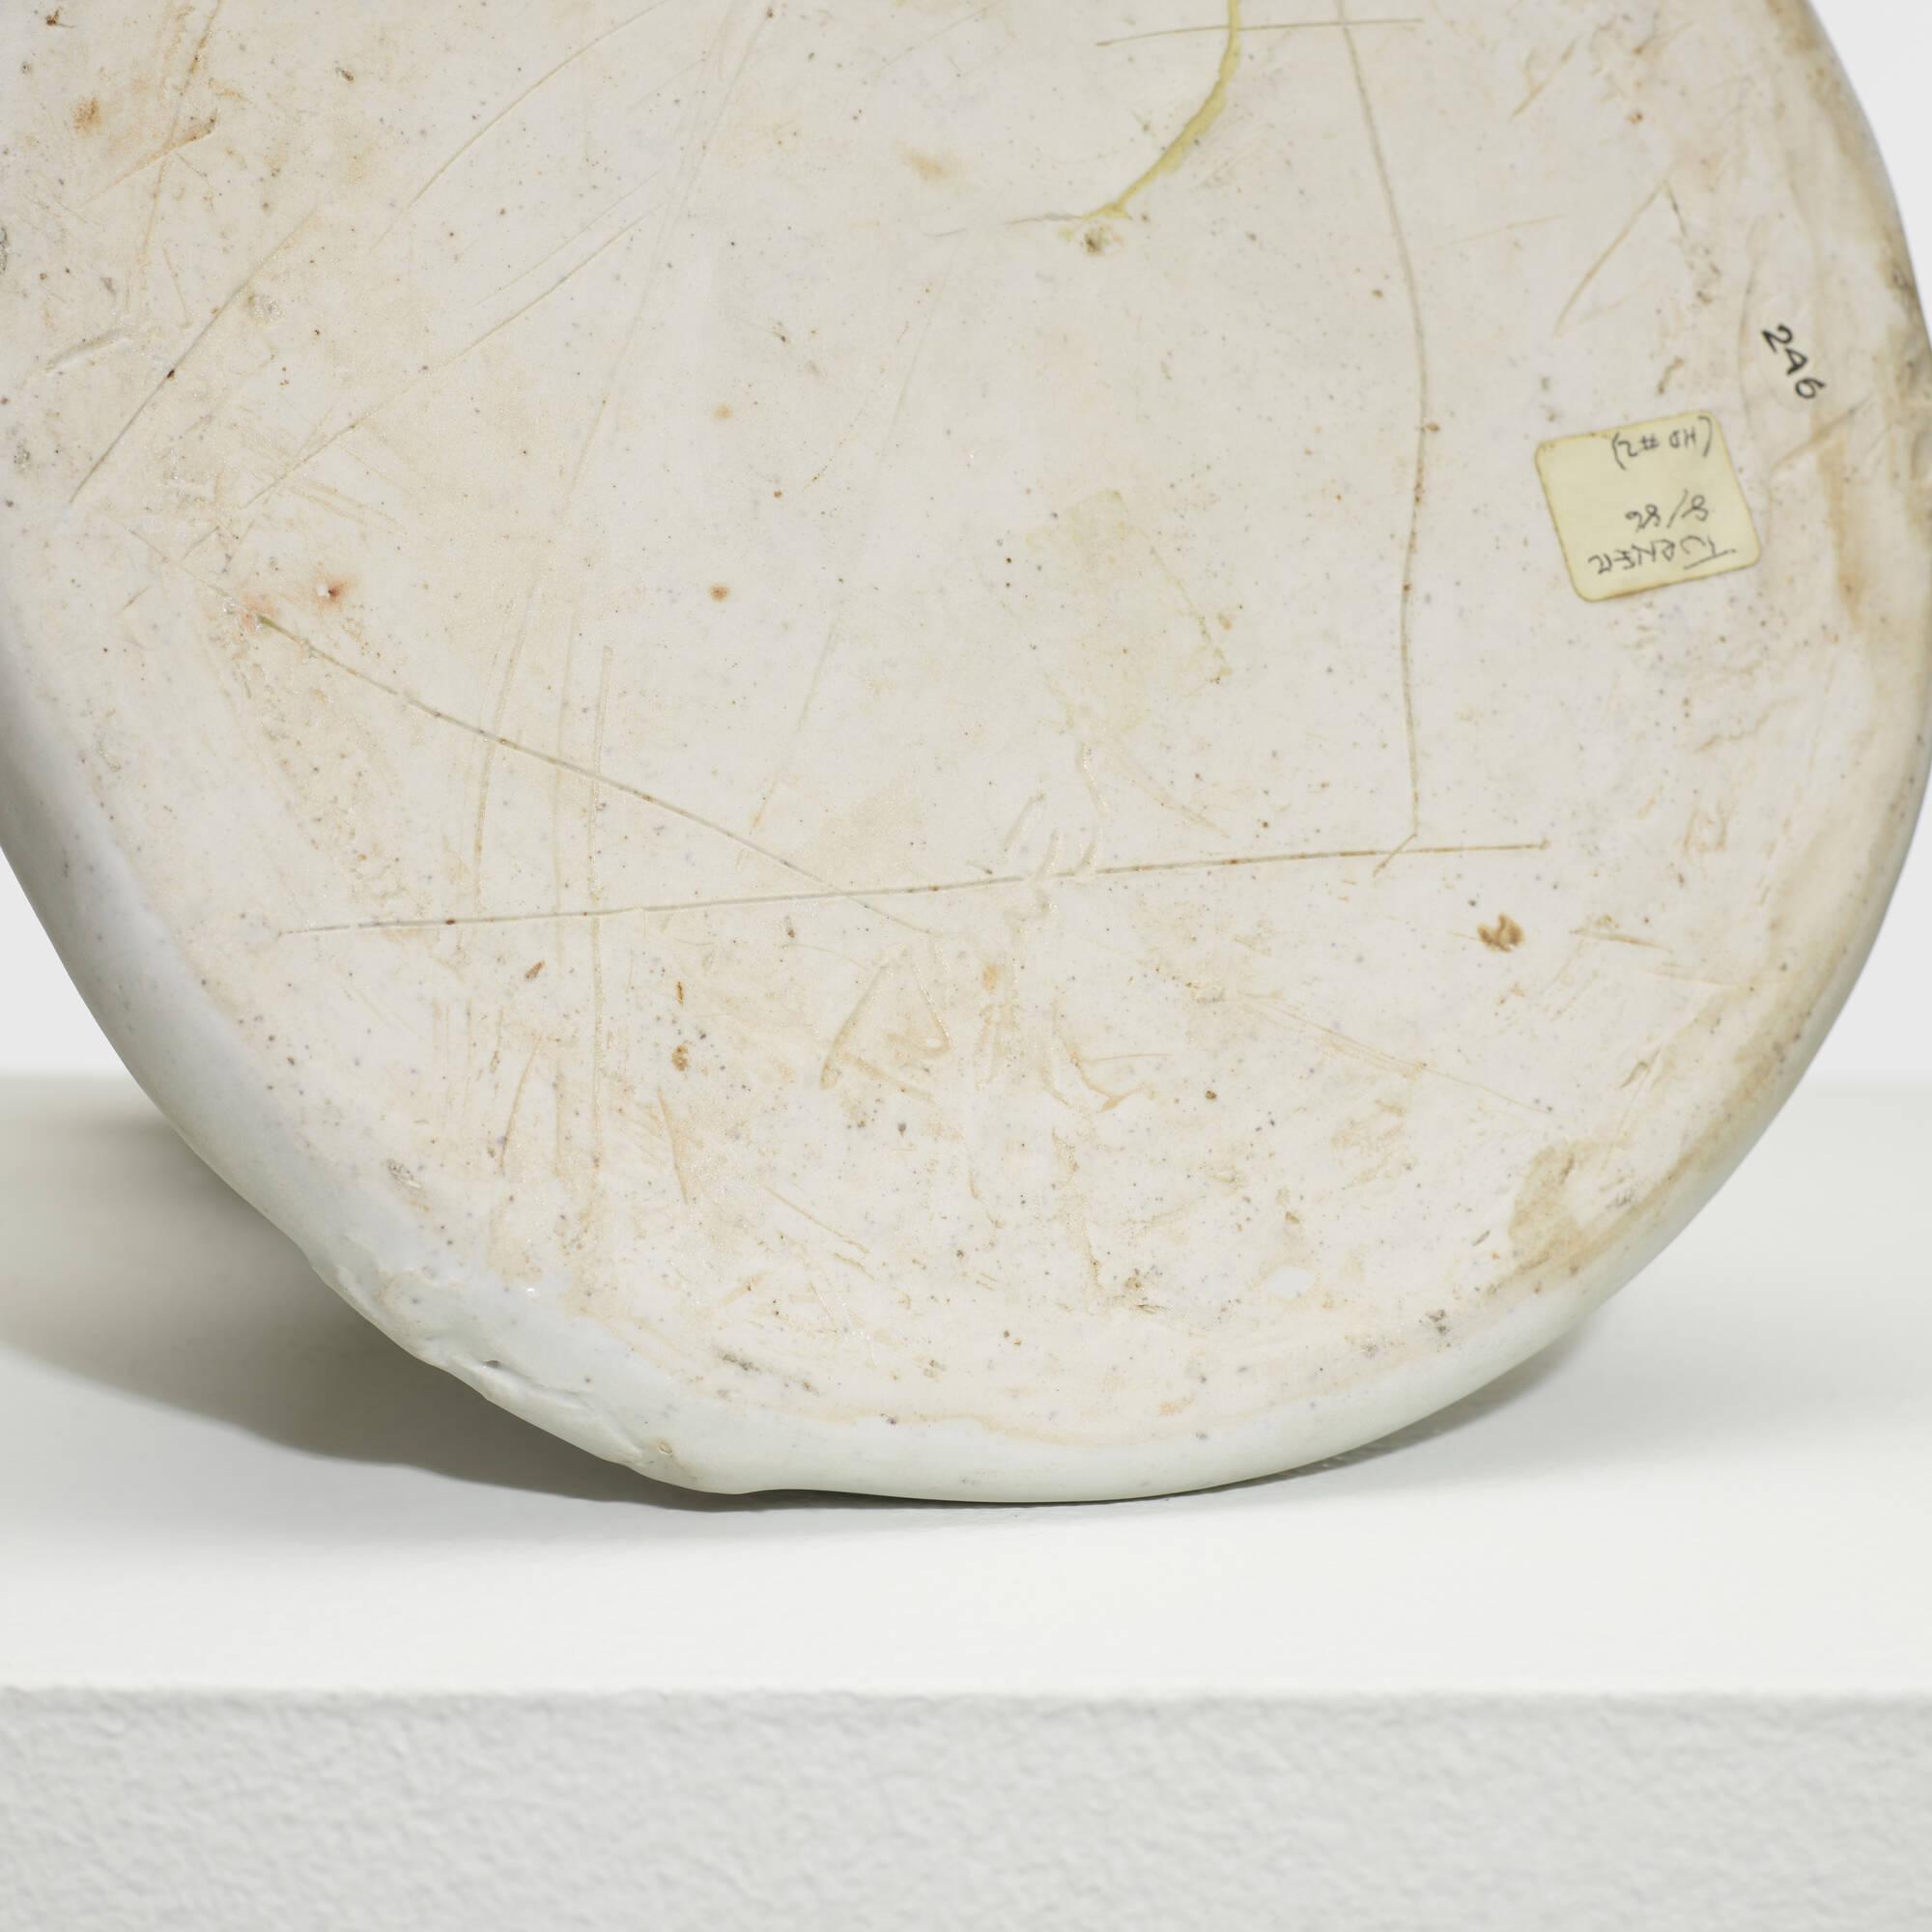 229: Robert Turner / Untitled (2 of 2)